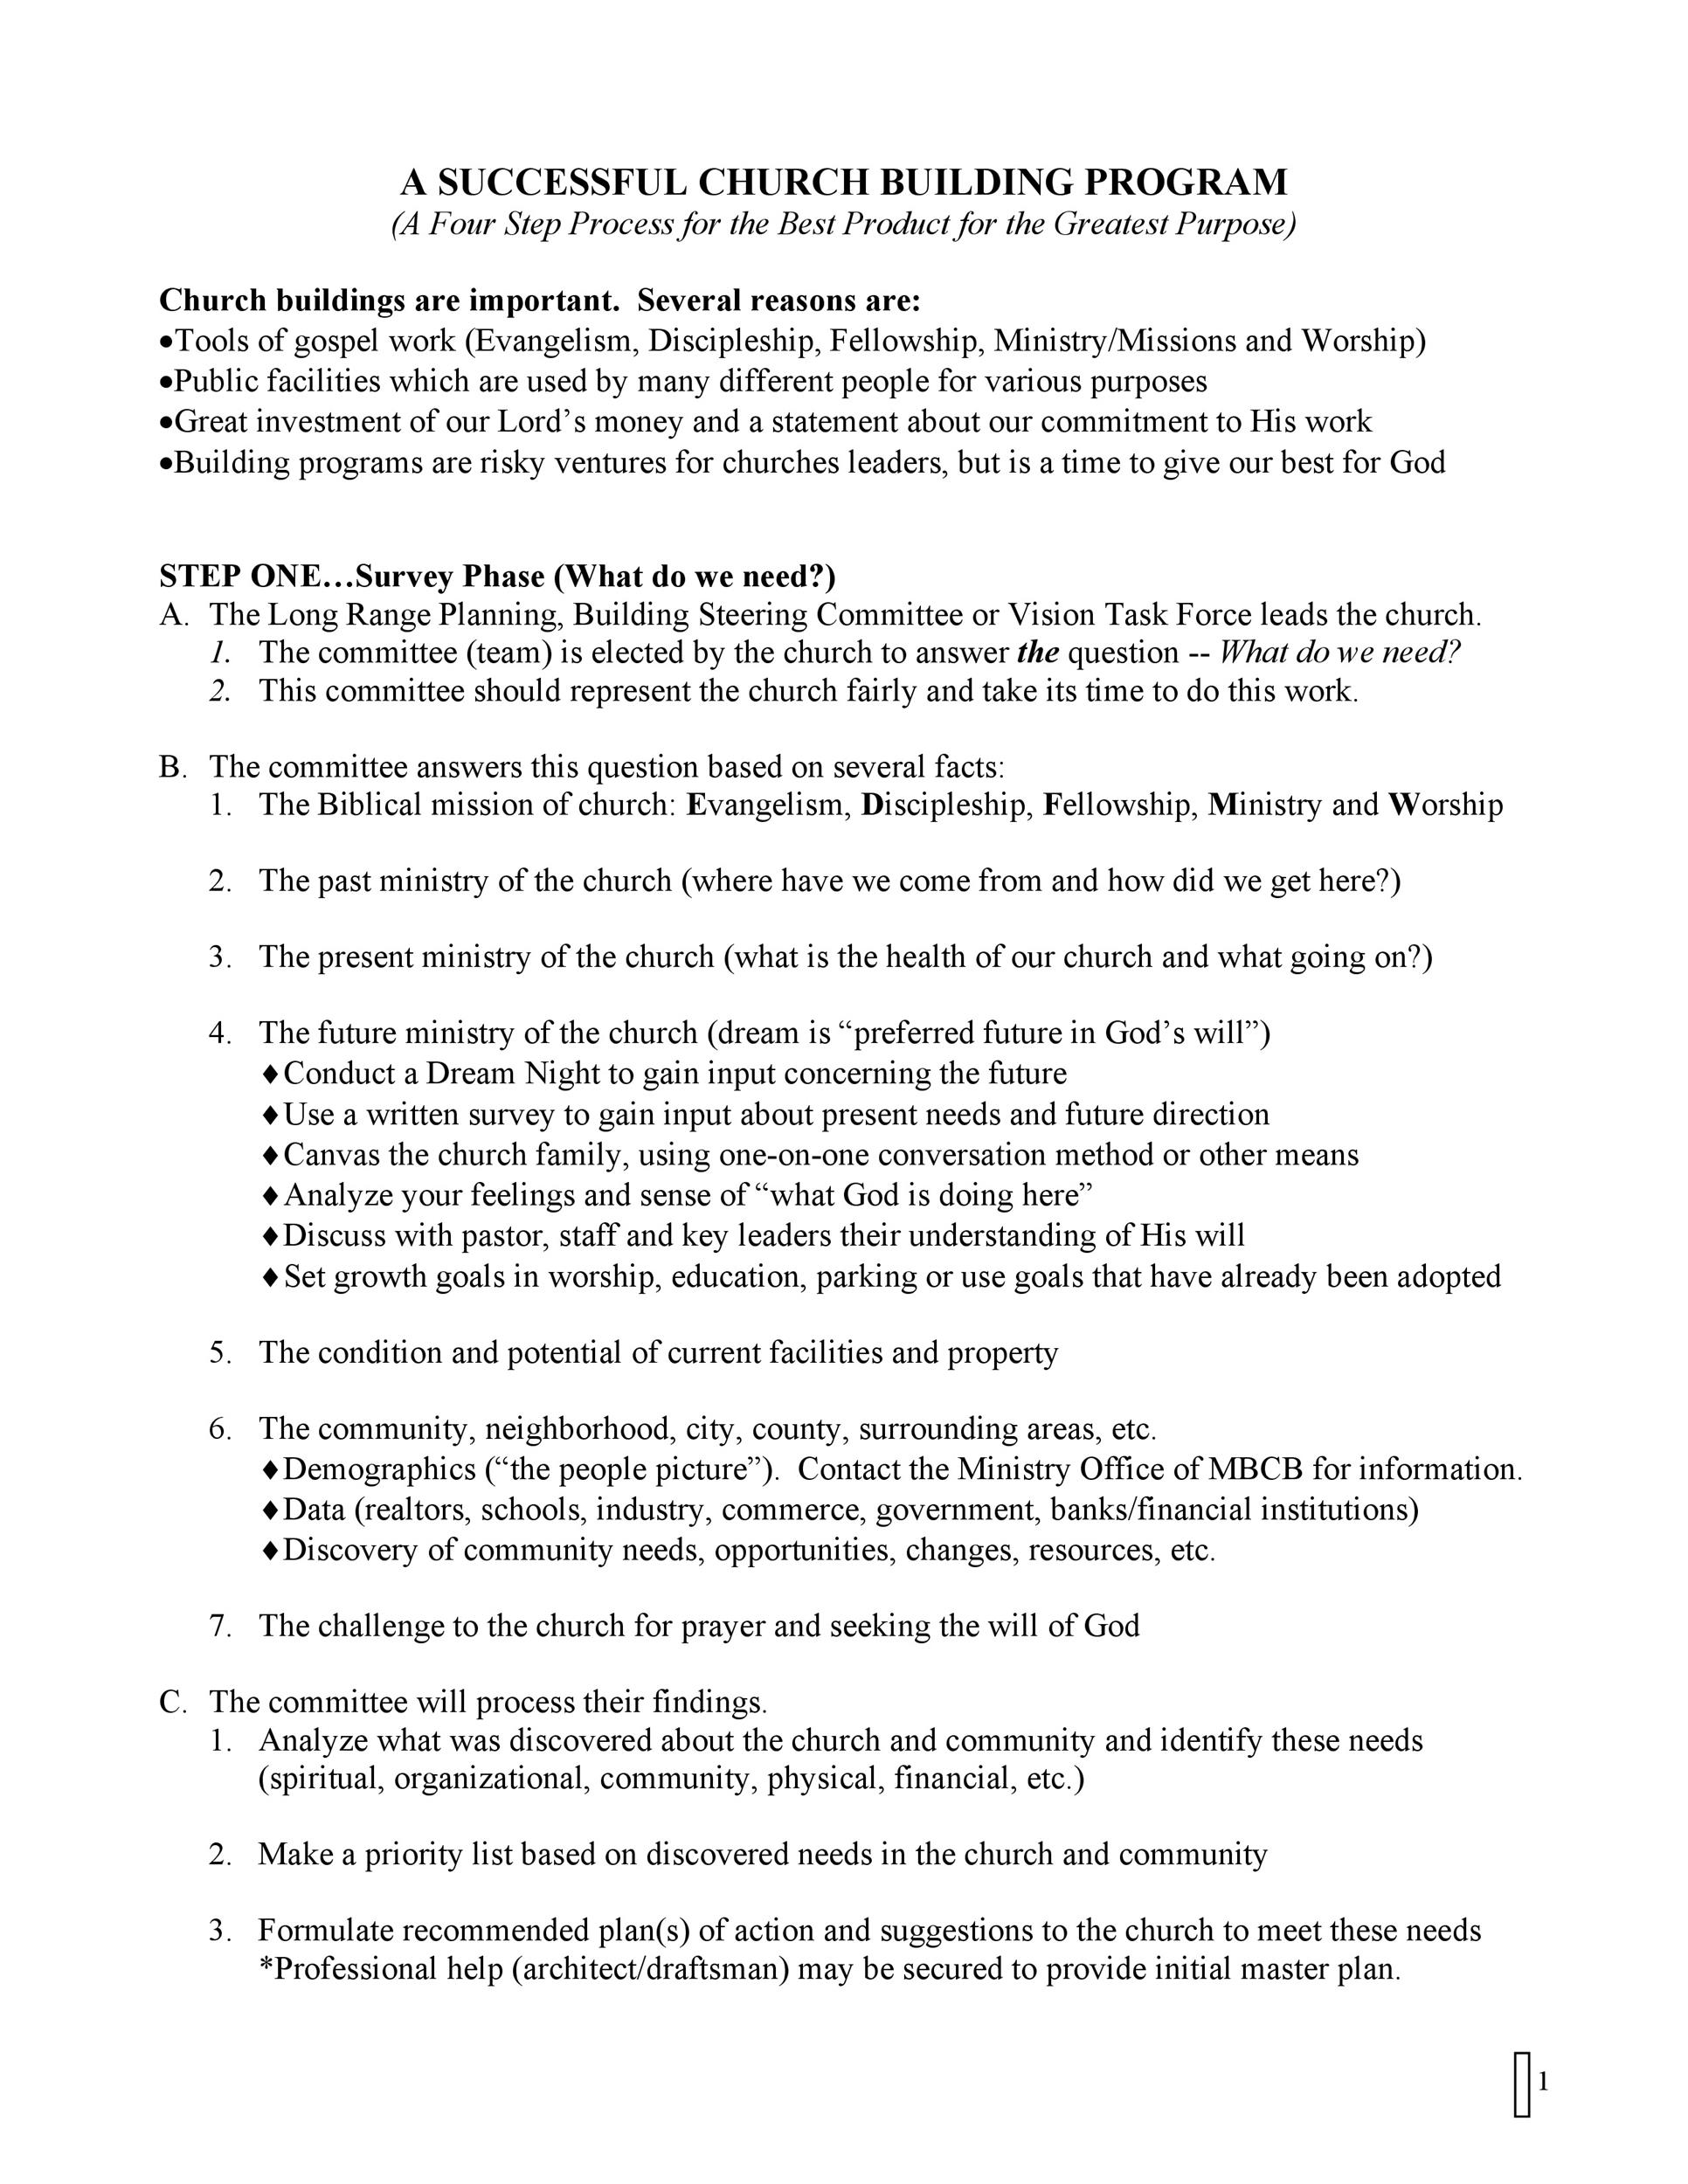 Free church bulletin templates 23